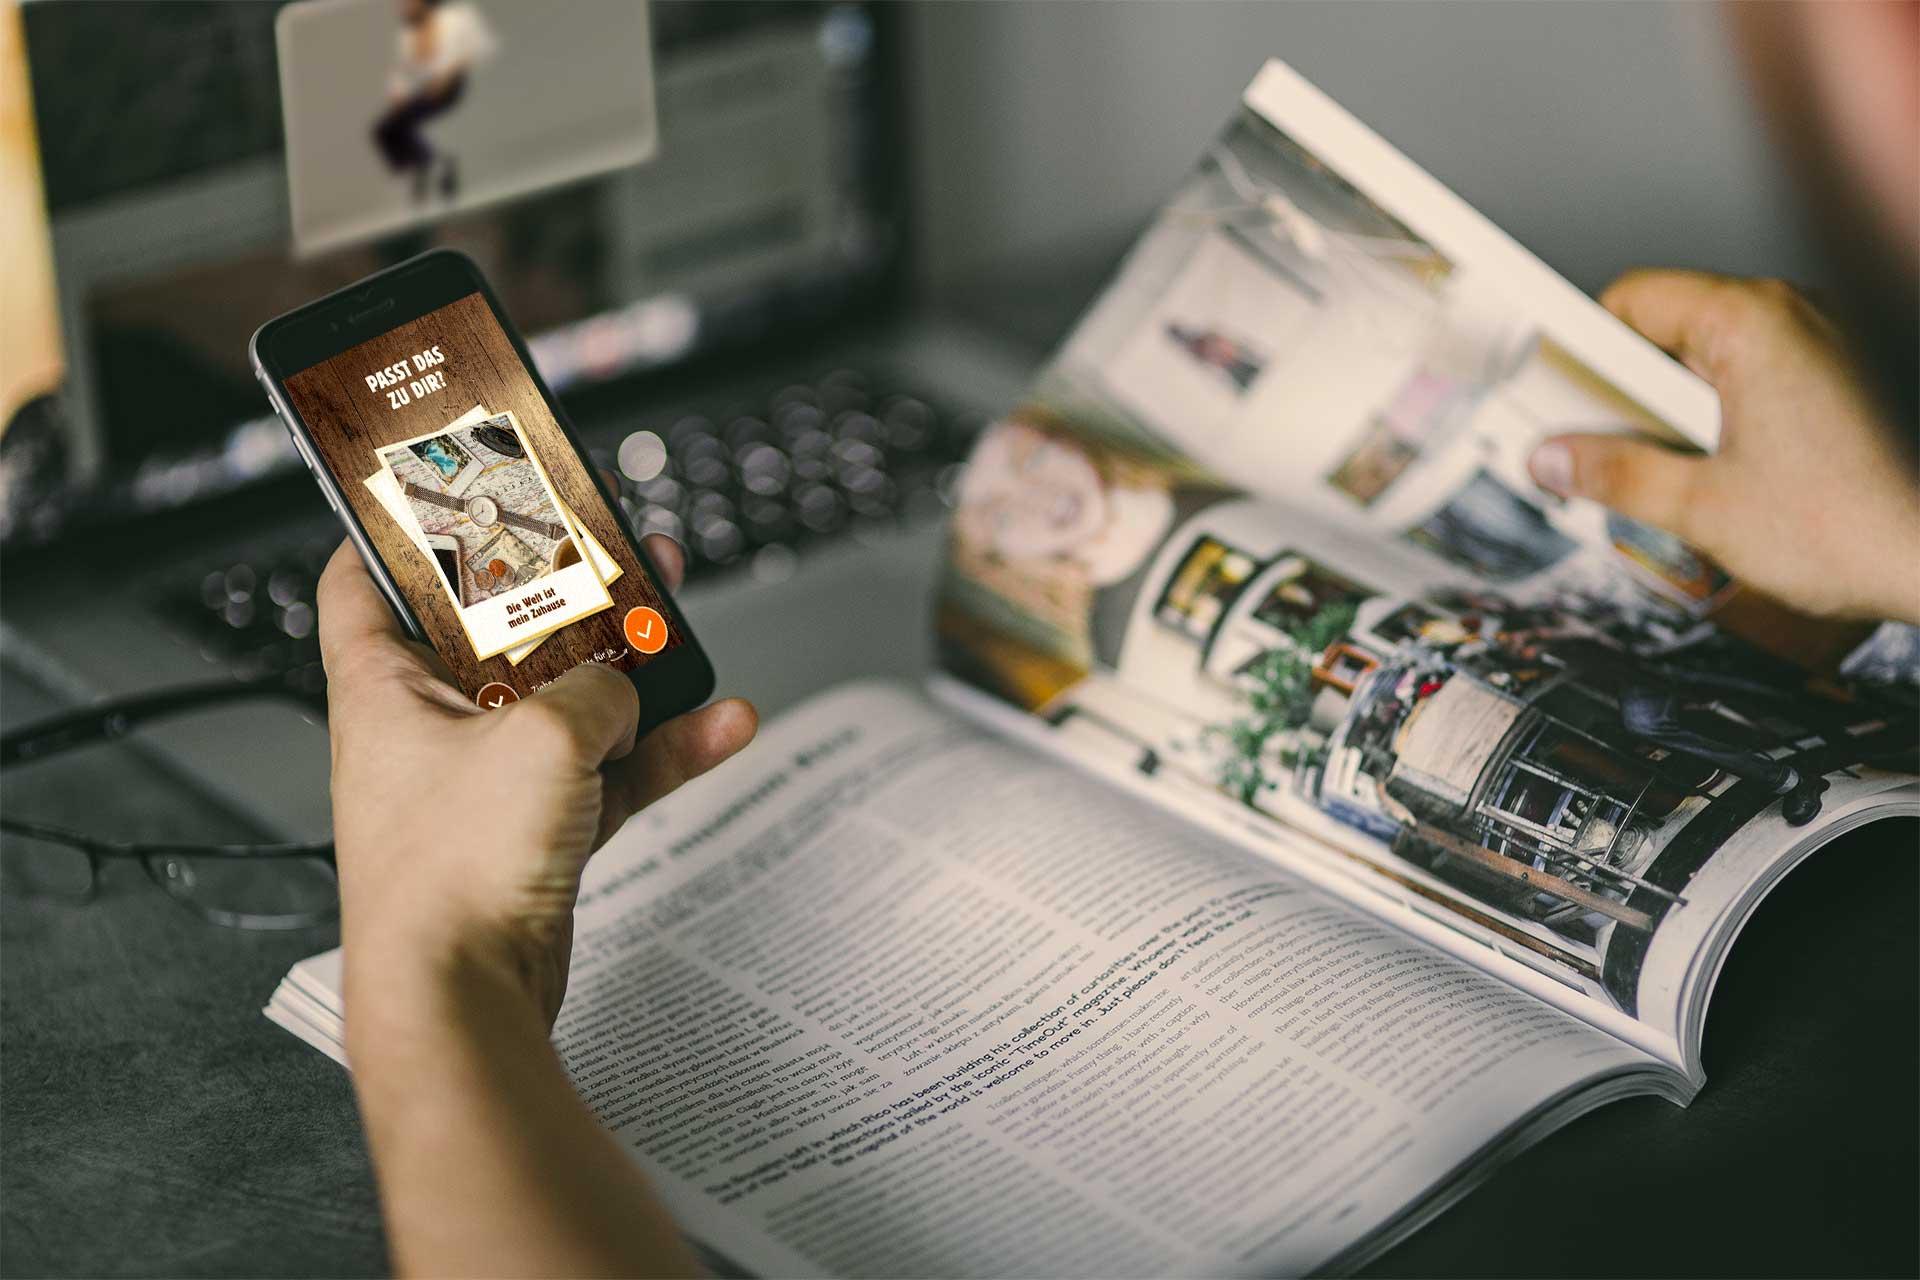 Case Study Mockup iPhone 4 Ragusa Win INTERNAL 170609